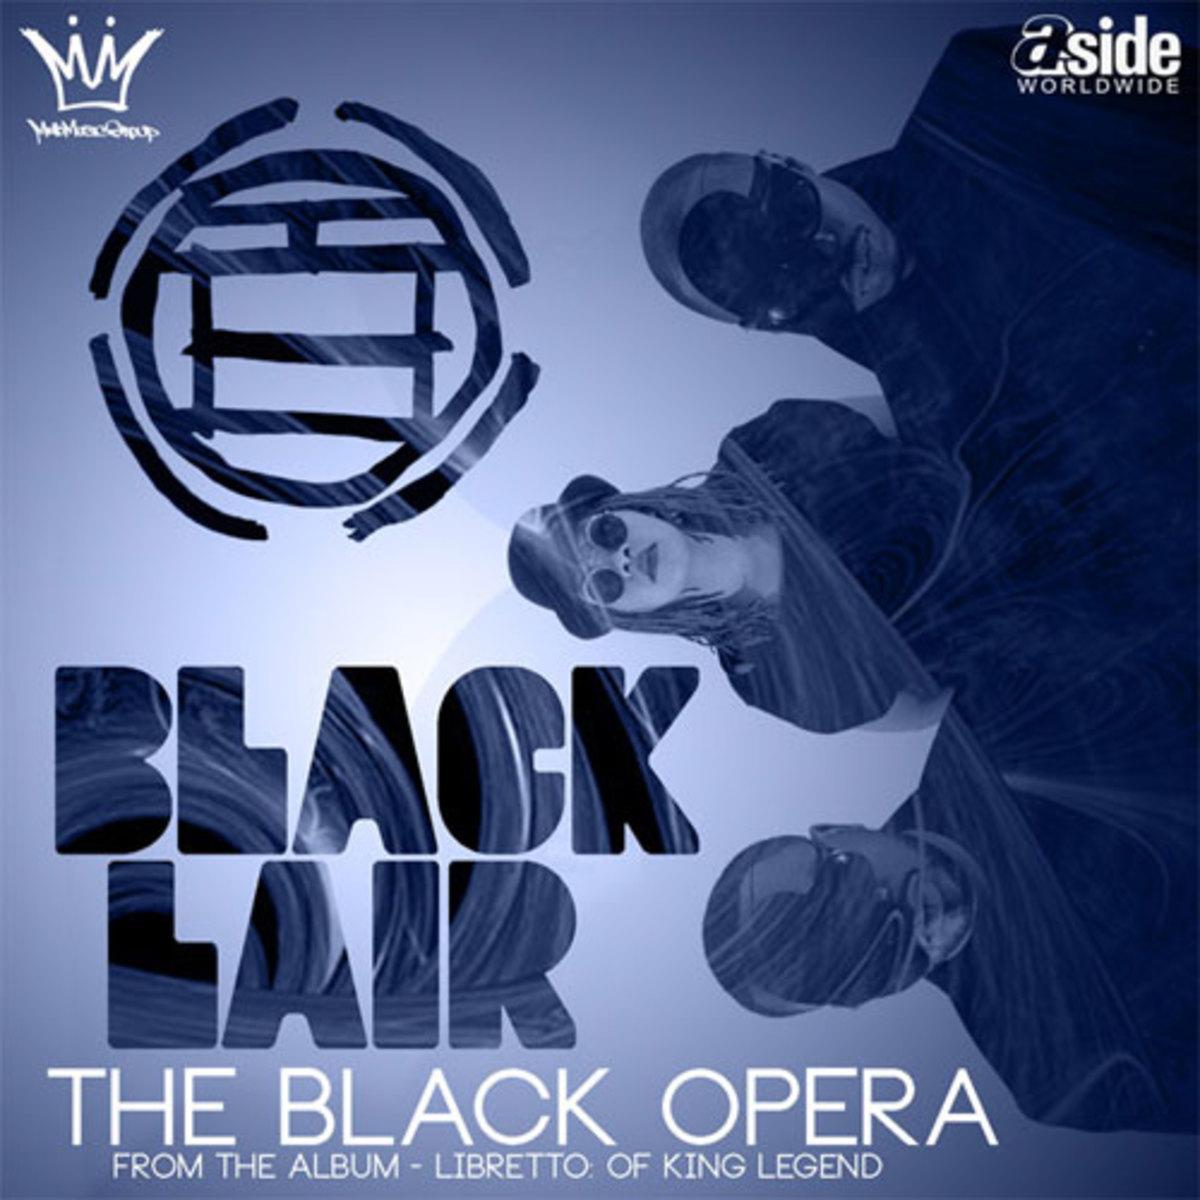 theblackopera-blacklair.jpg